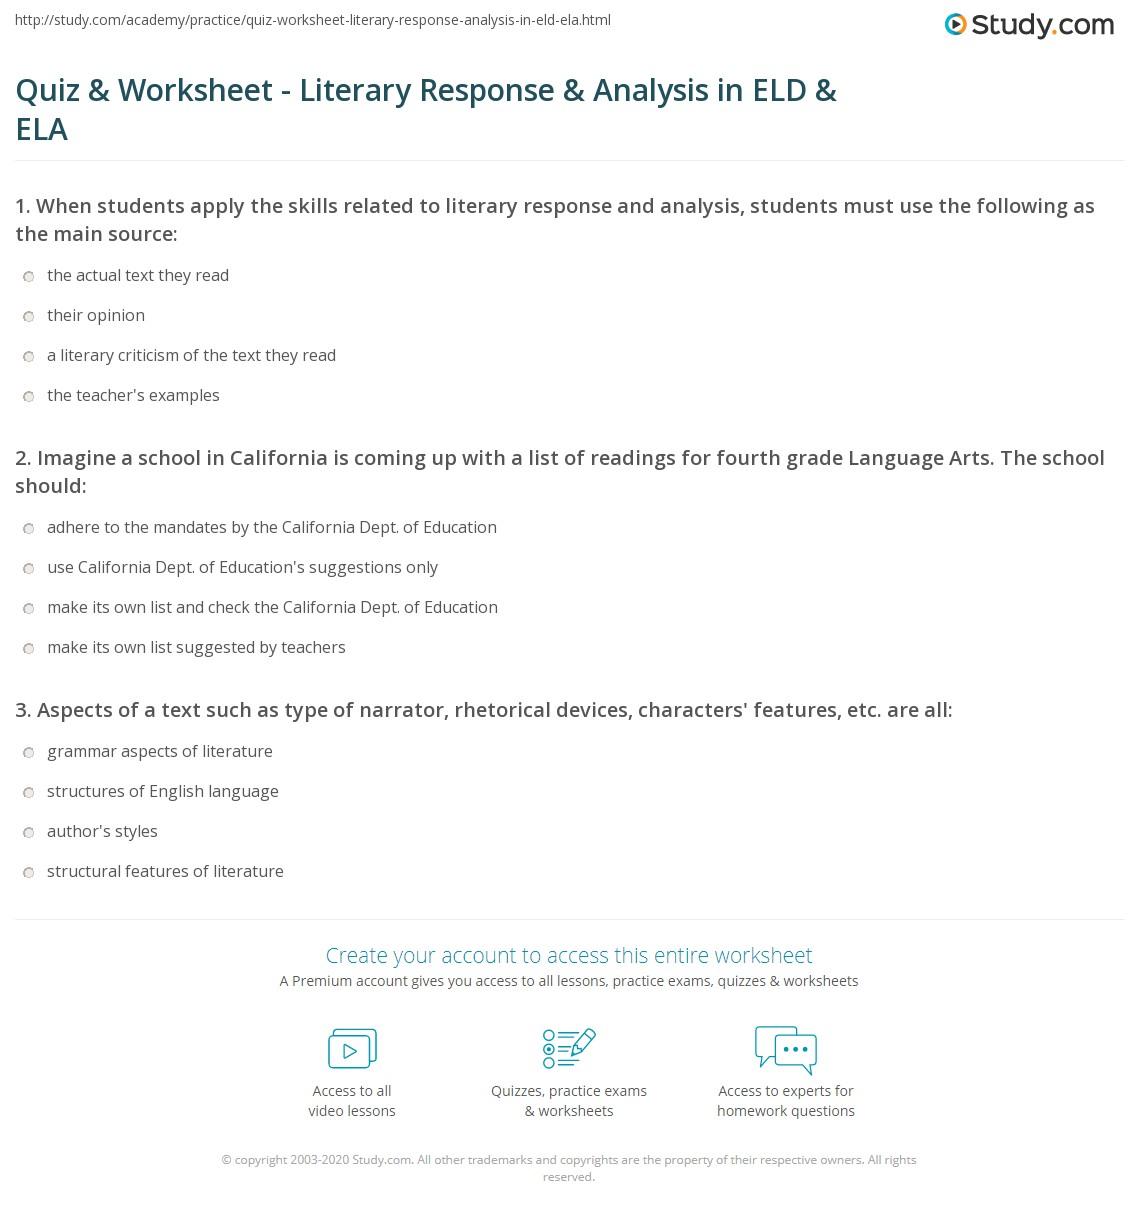 Quiz Worksheet Literary Response Analysis In Eld Ela Study